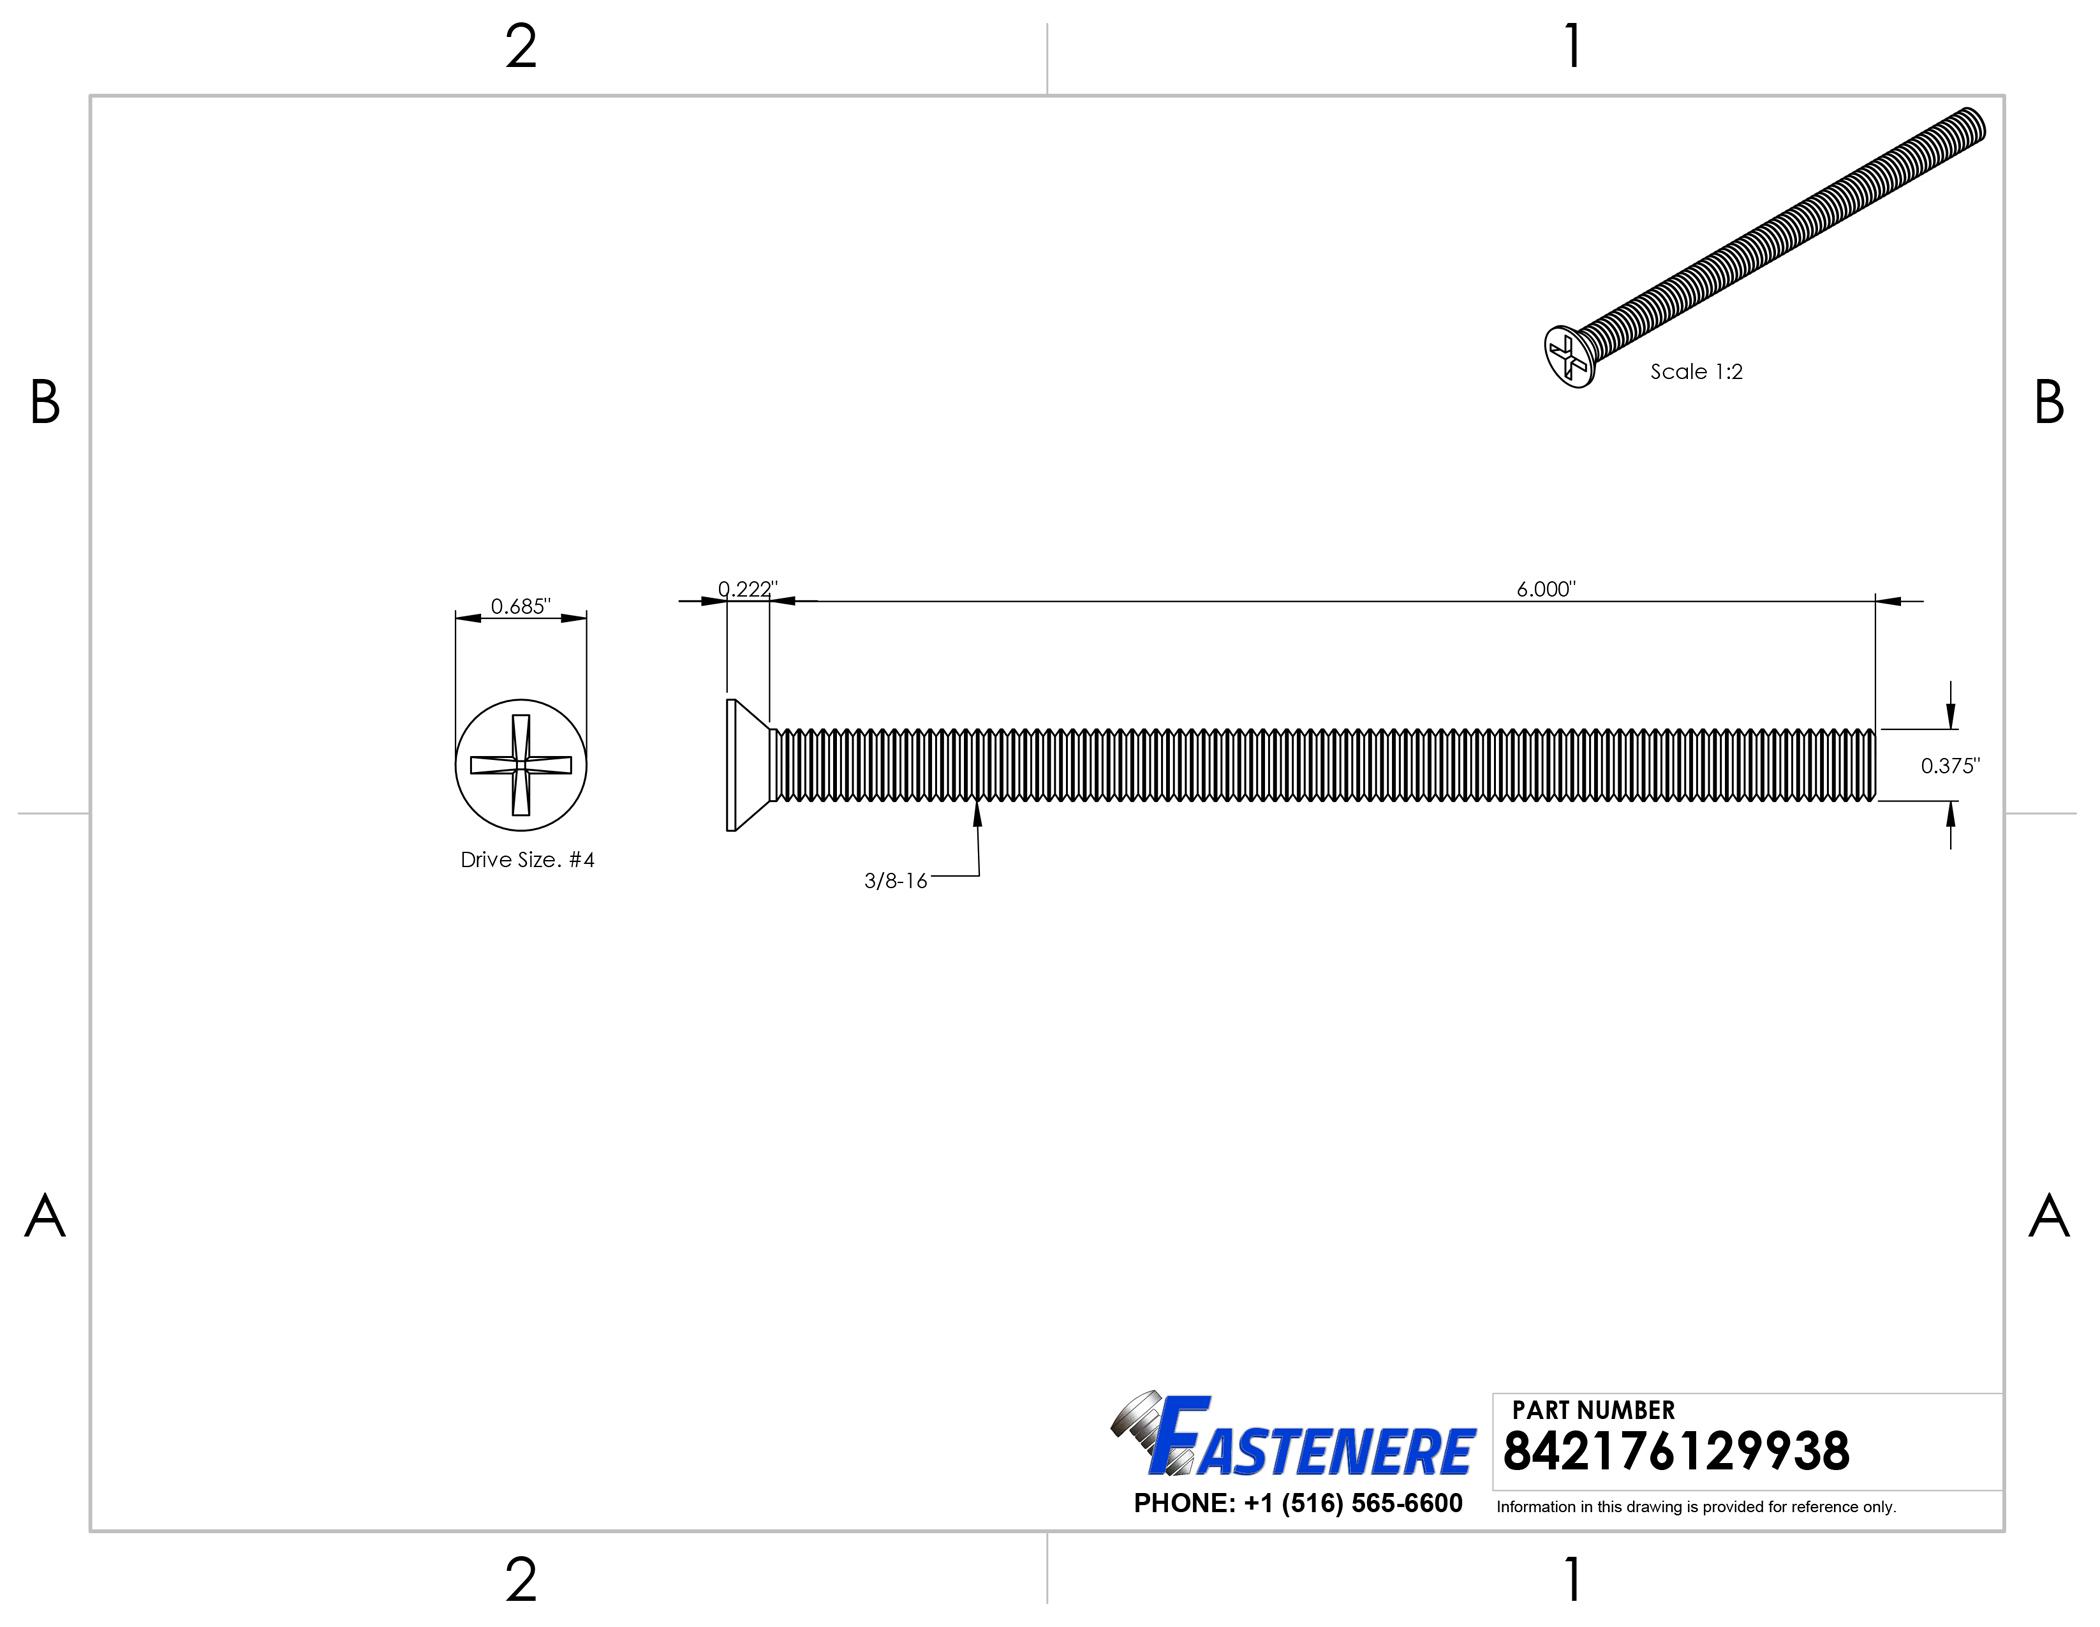 5 PCS AT25128B-SSHL-T SOP-8 AT25128AN-10SU-2.7 AT25128 SMD8 SPI Serial EEPROMs